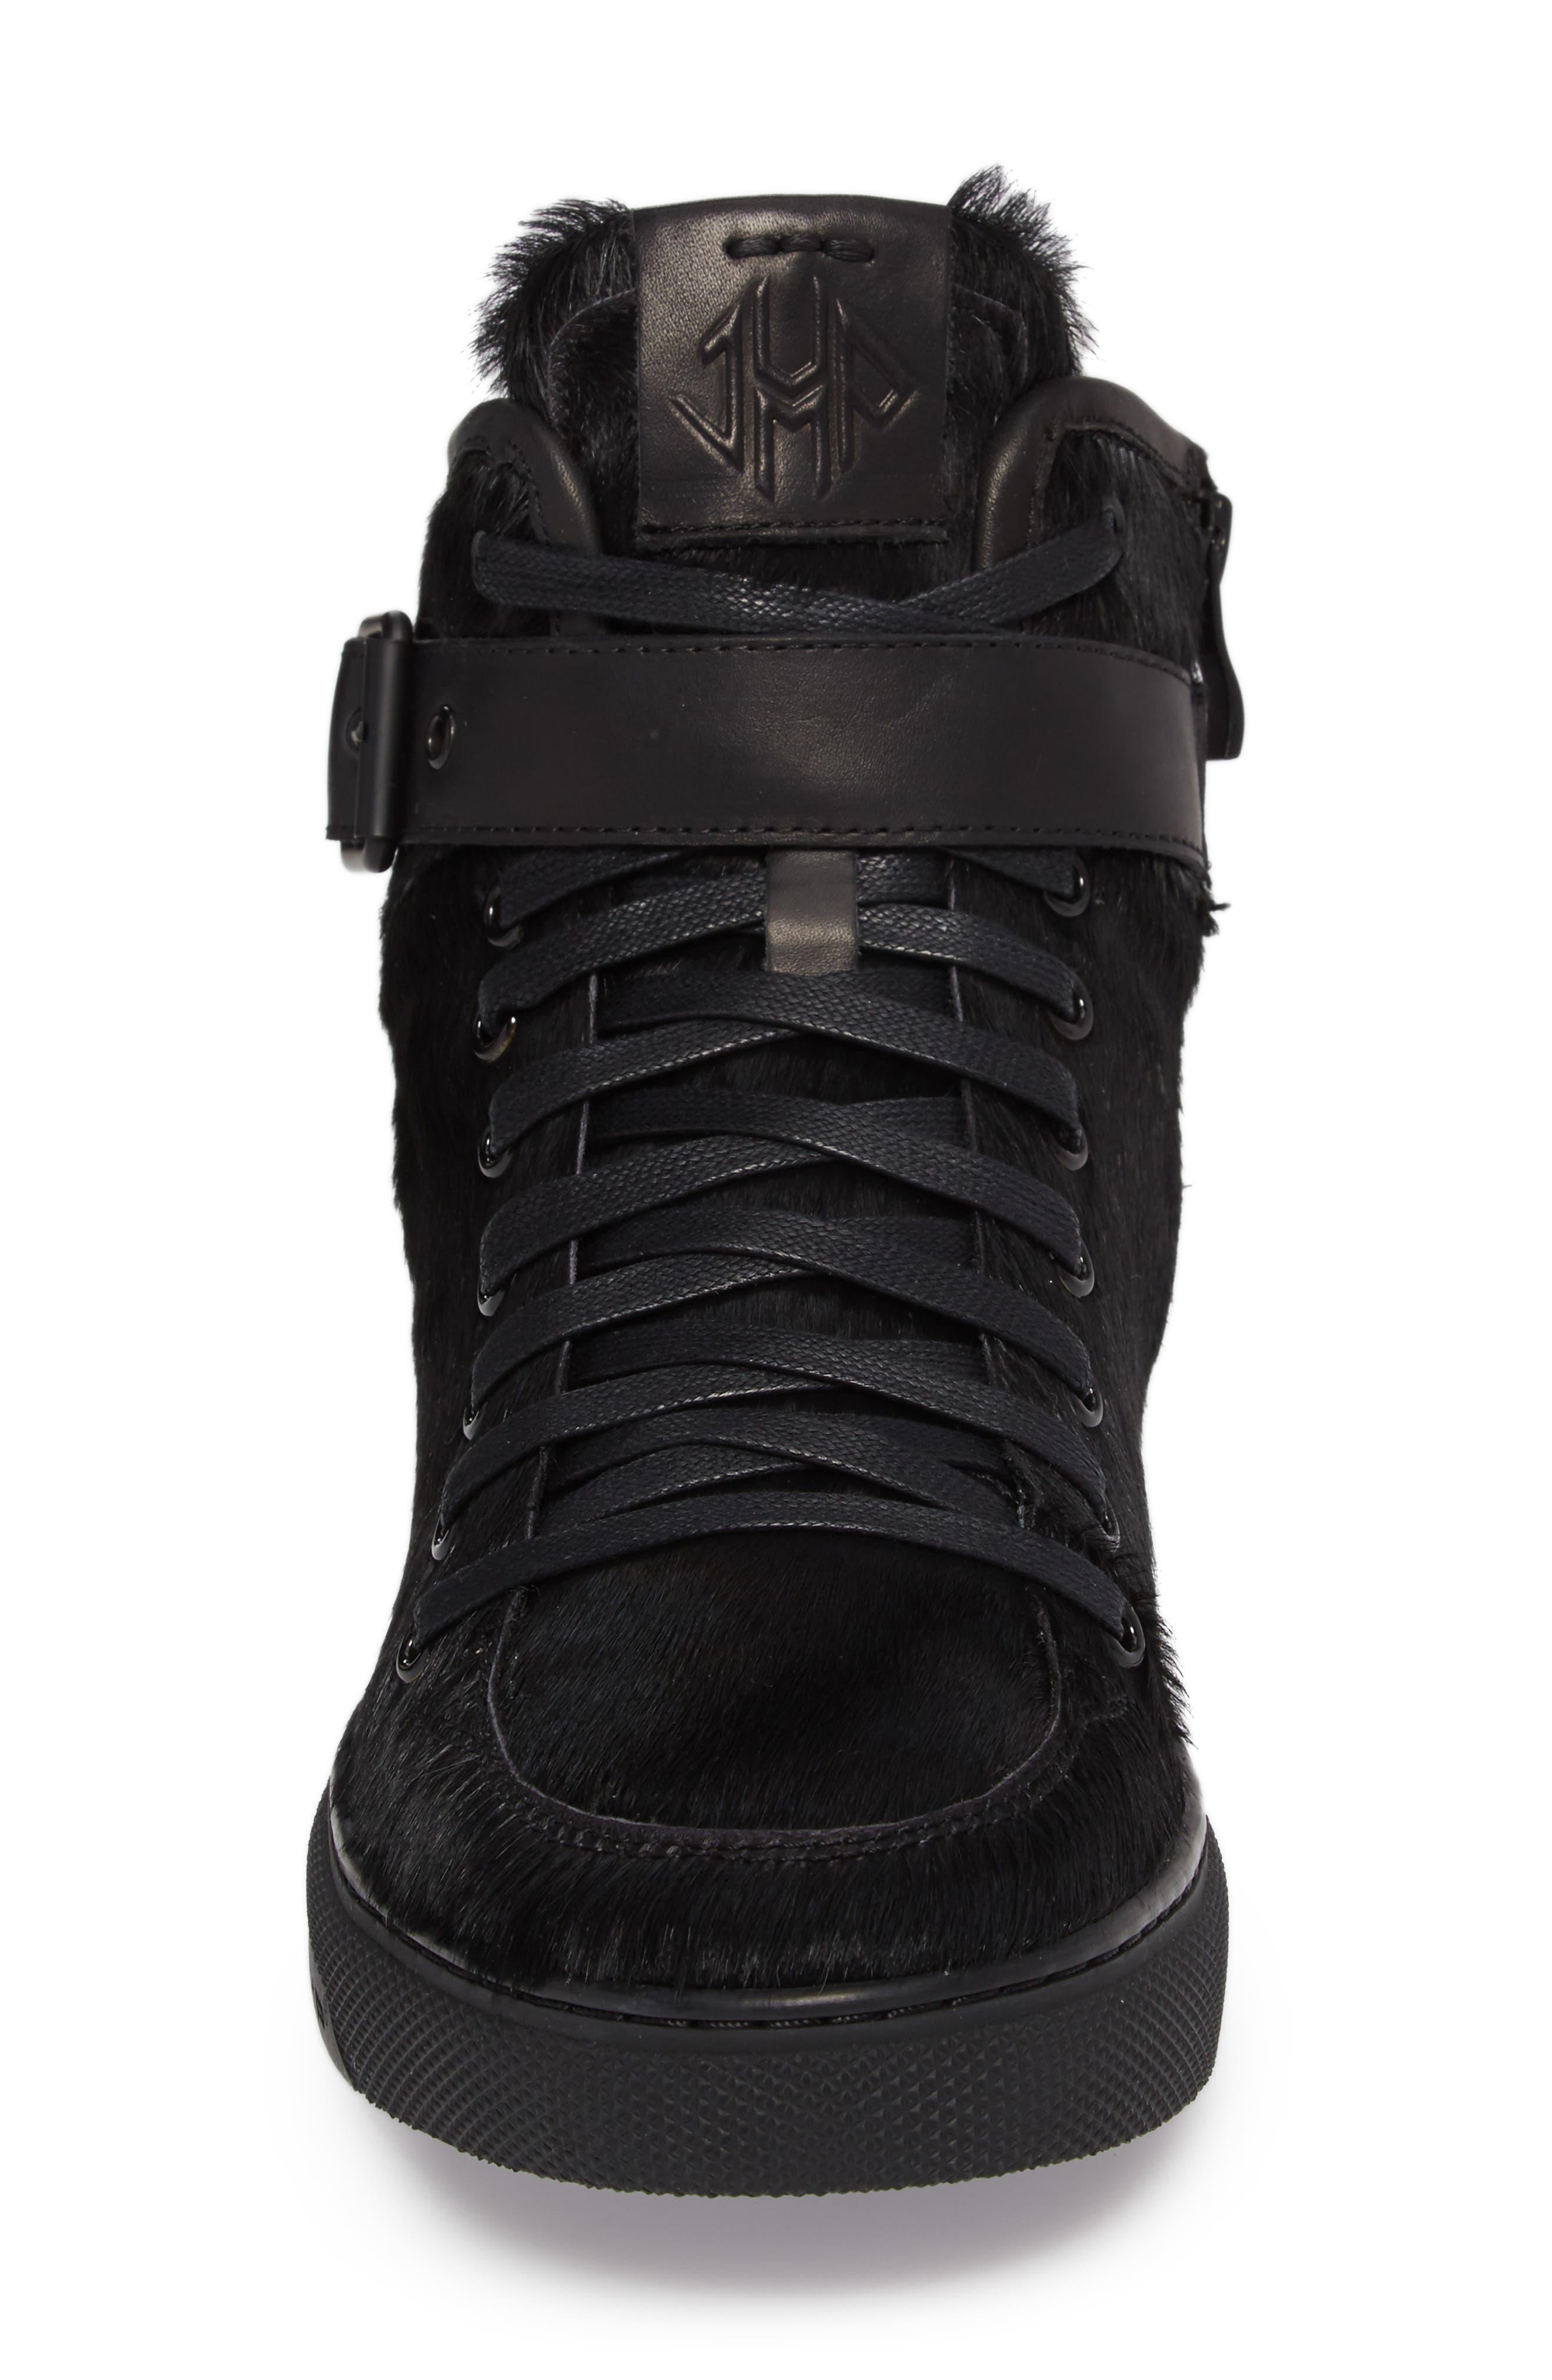 Sullivan Genuine Calf Hair High Top Sneaker,                             Alternate thumbnail 4, color,                             Black Fur Leather